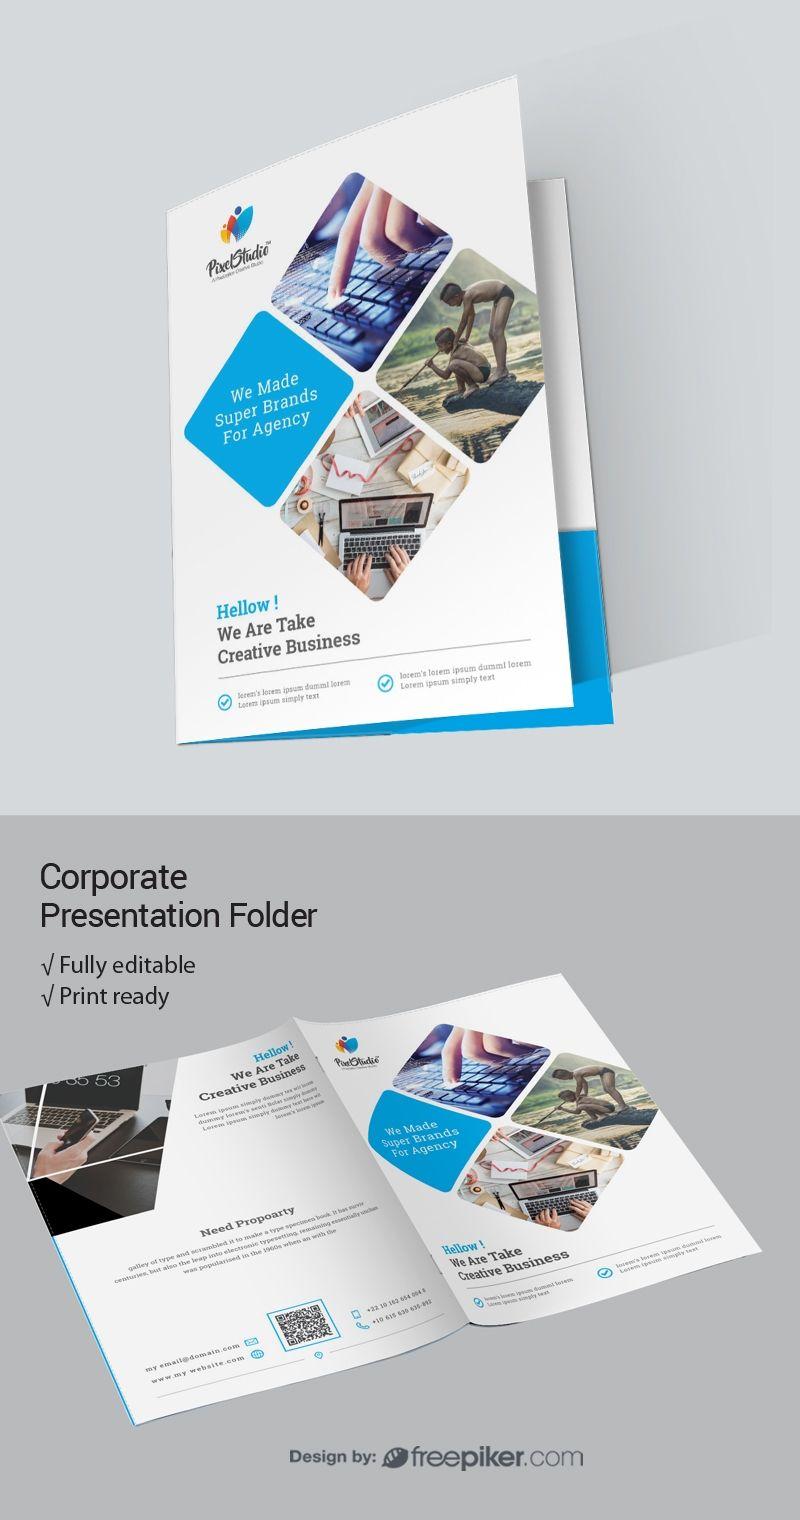 Corporate presentation folder presentation folder design